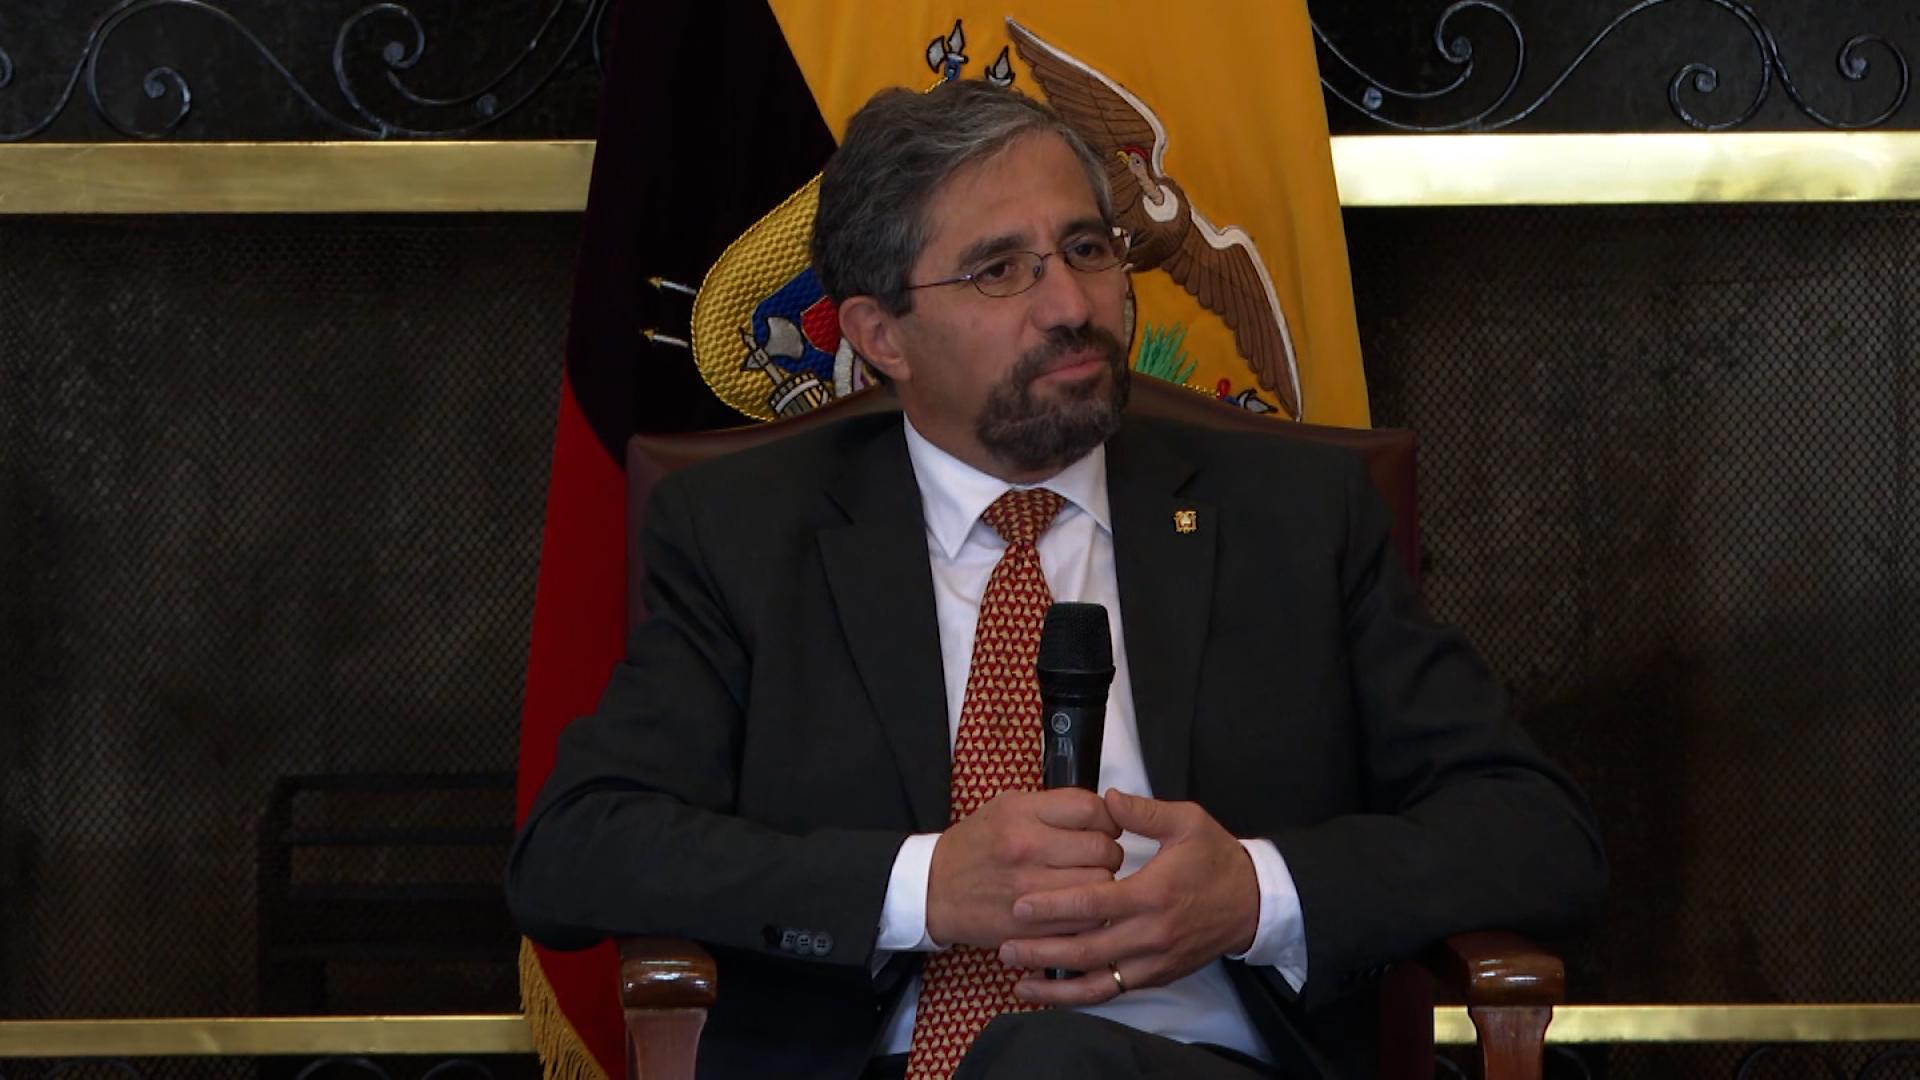 Mauricio Montalvo